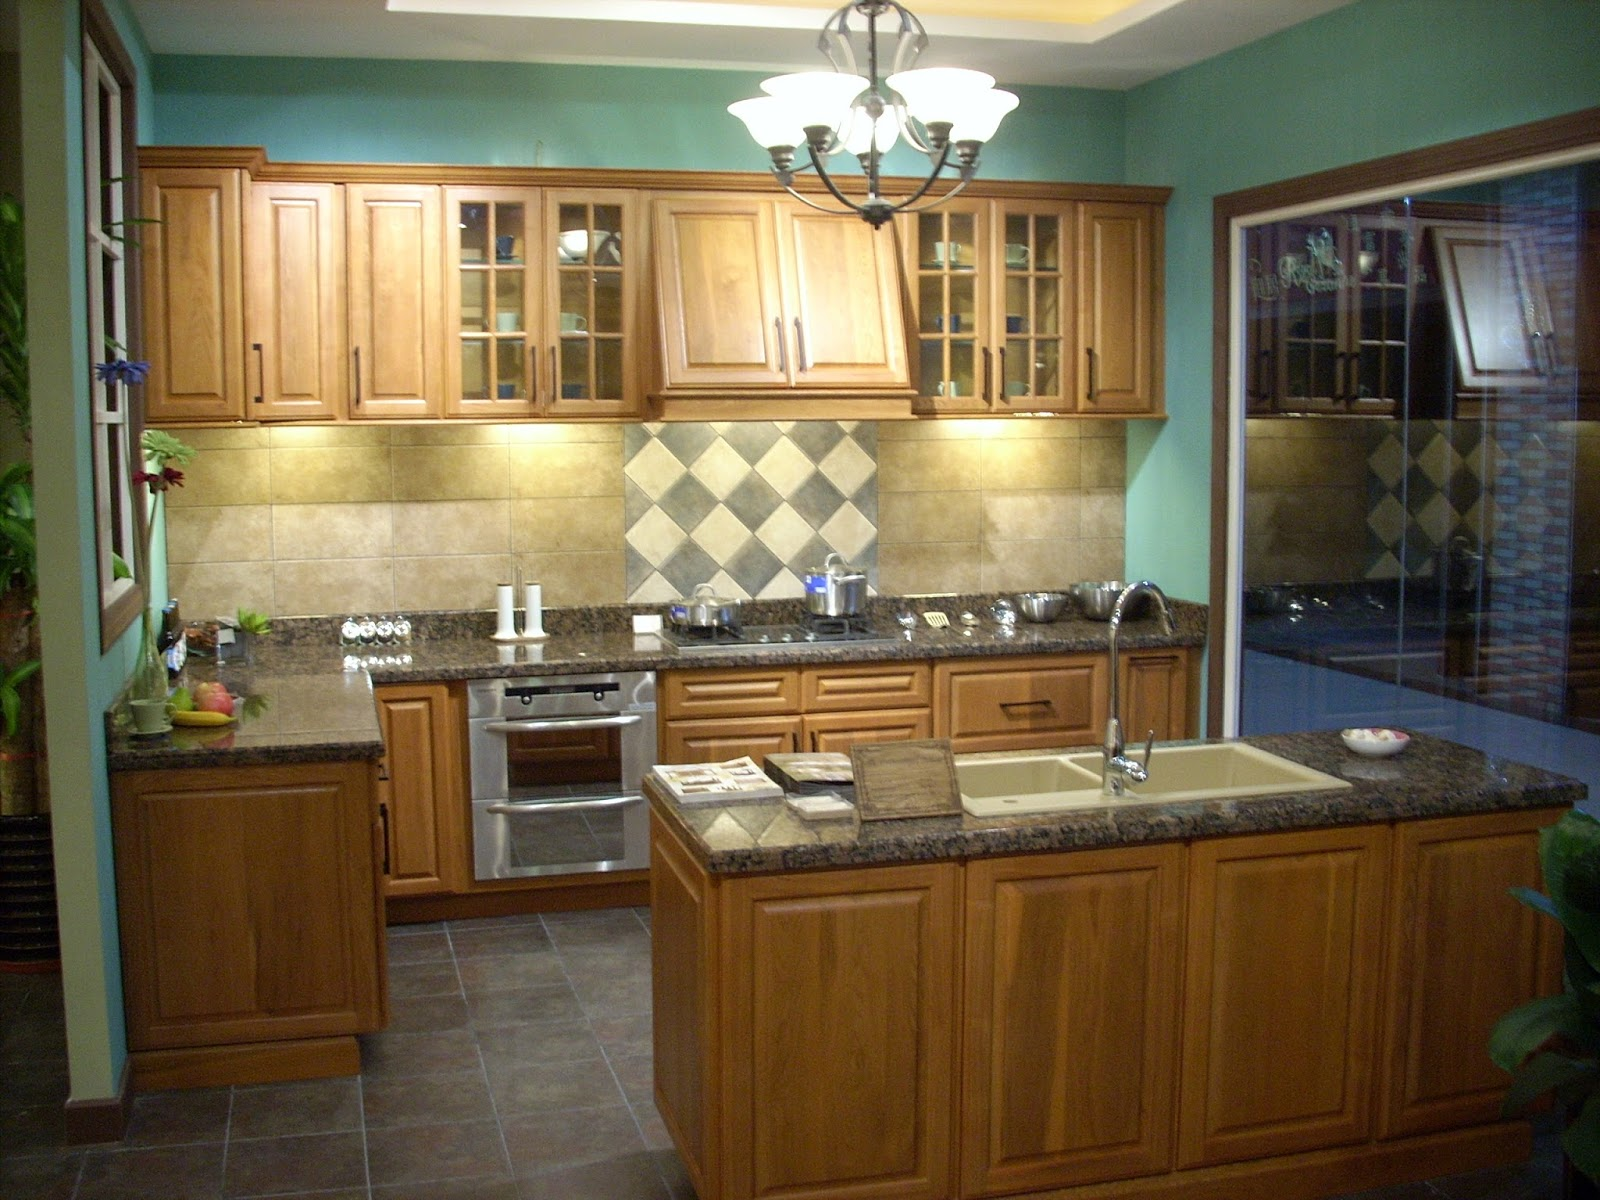 Mdf Kitchen Cabinet Doors Bulbs 如何选购实木橱柜 衣柜 以及柜门板 Mdf厨柜门